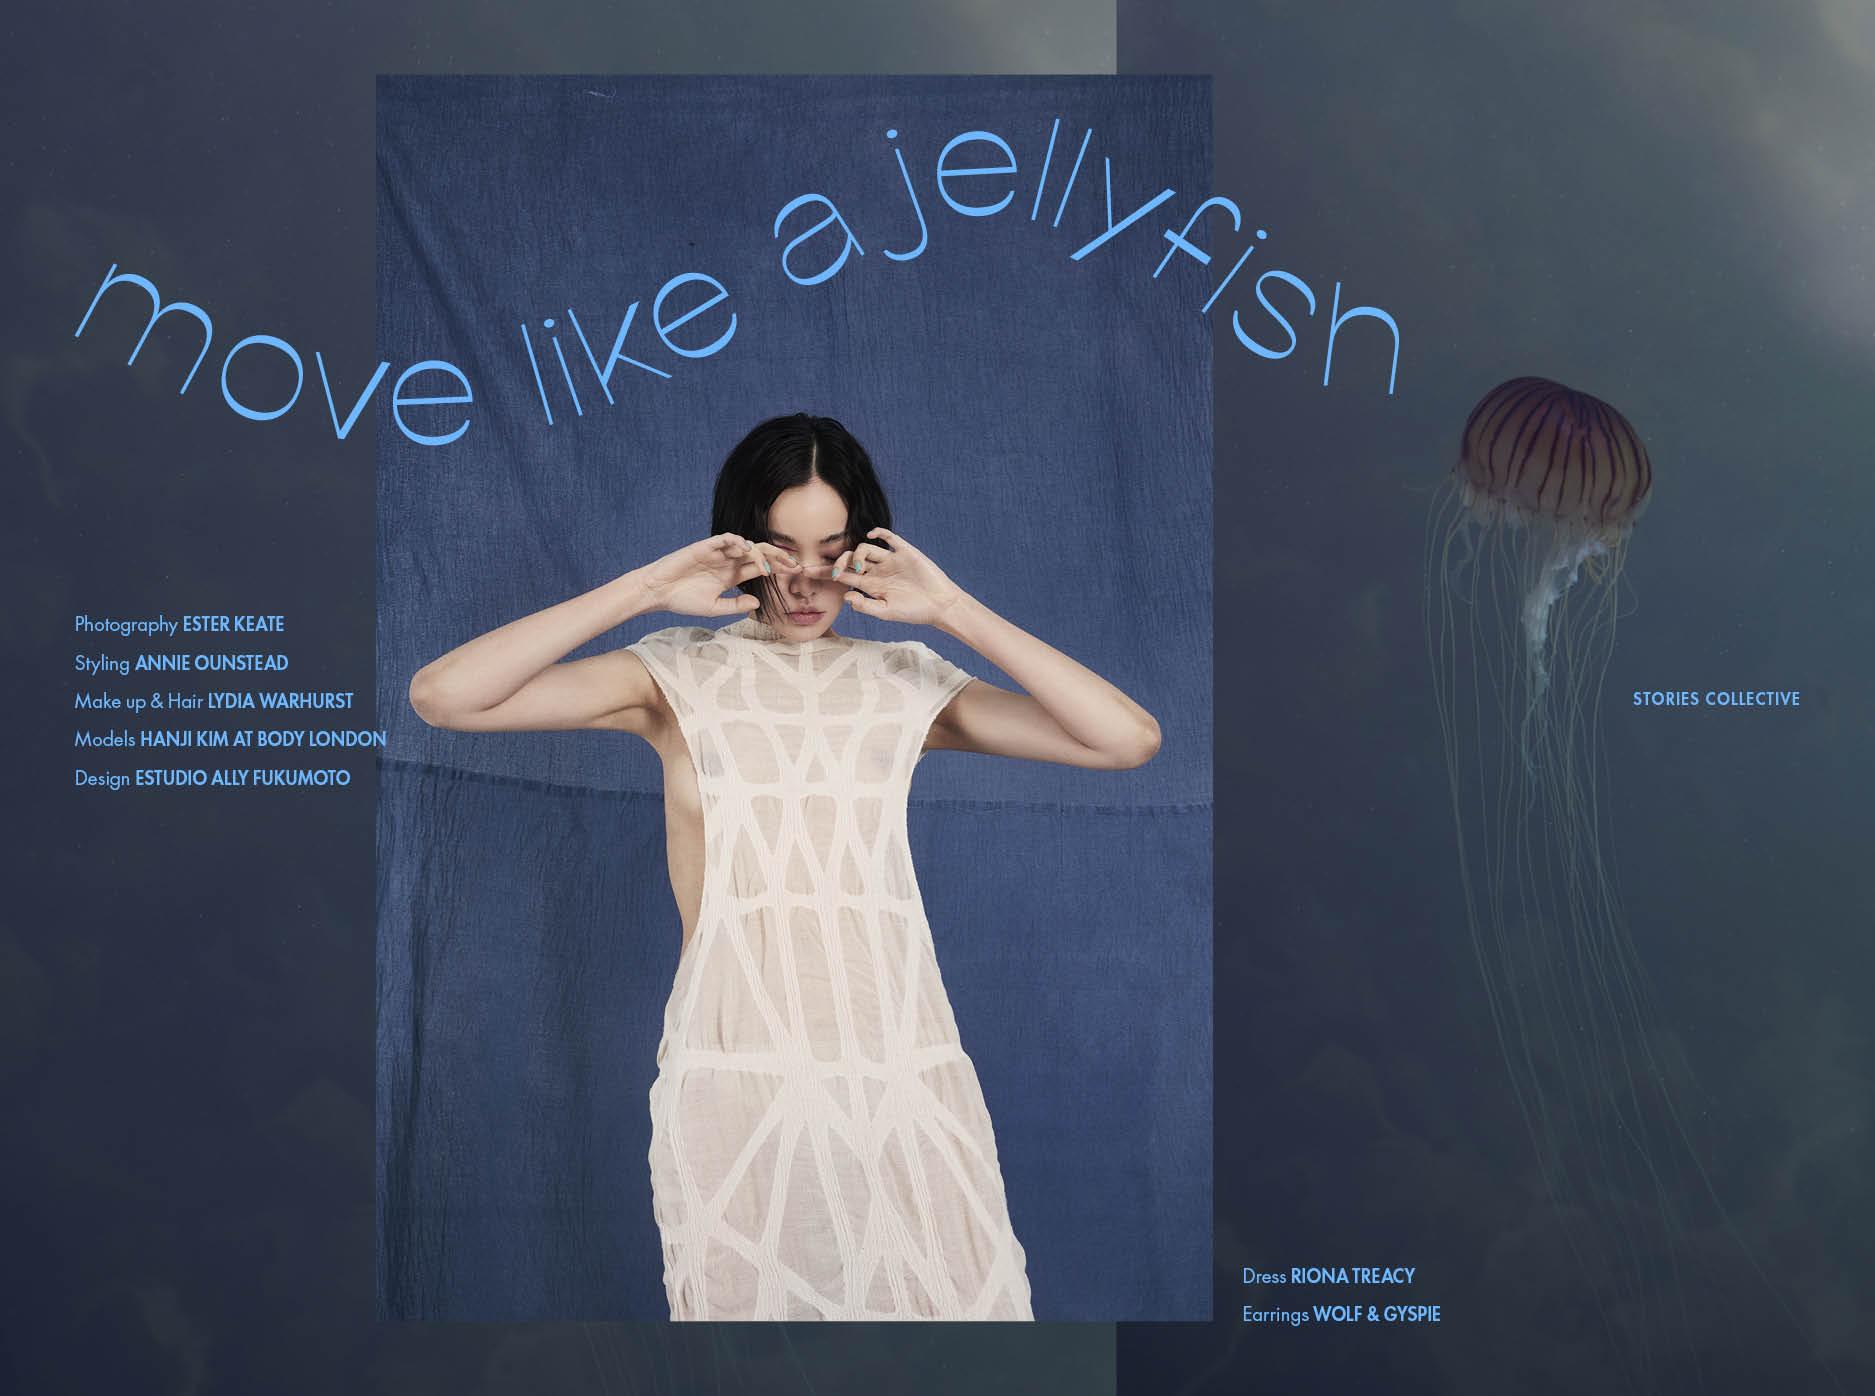 No-Mind State / Move Like a Jellyfish